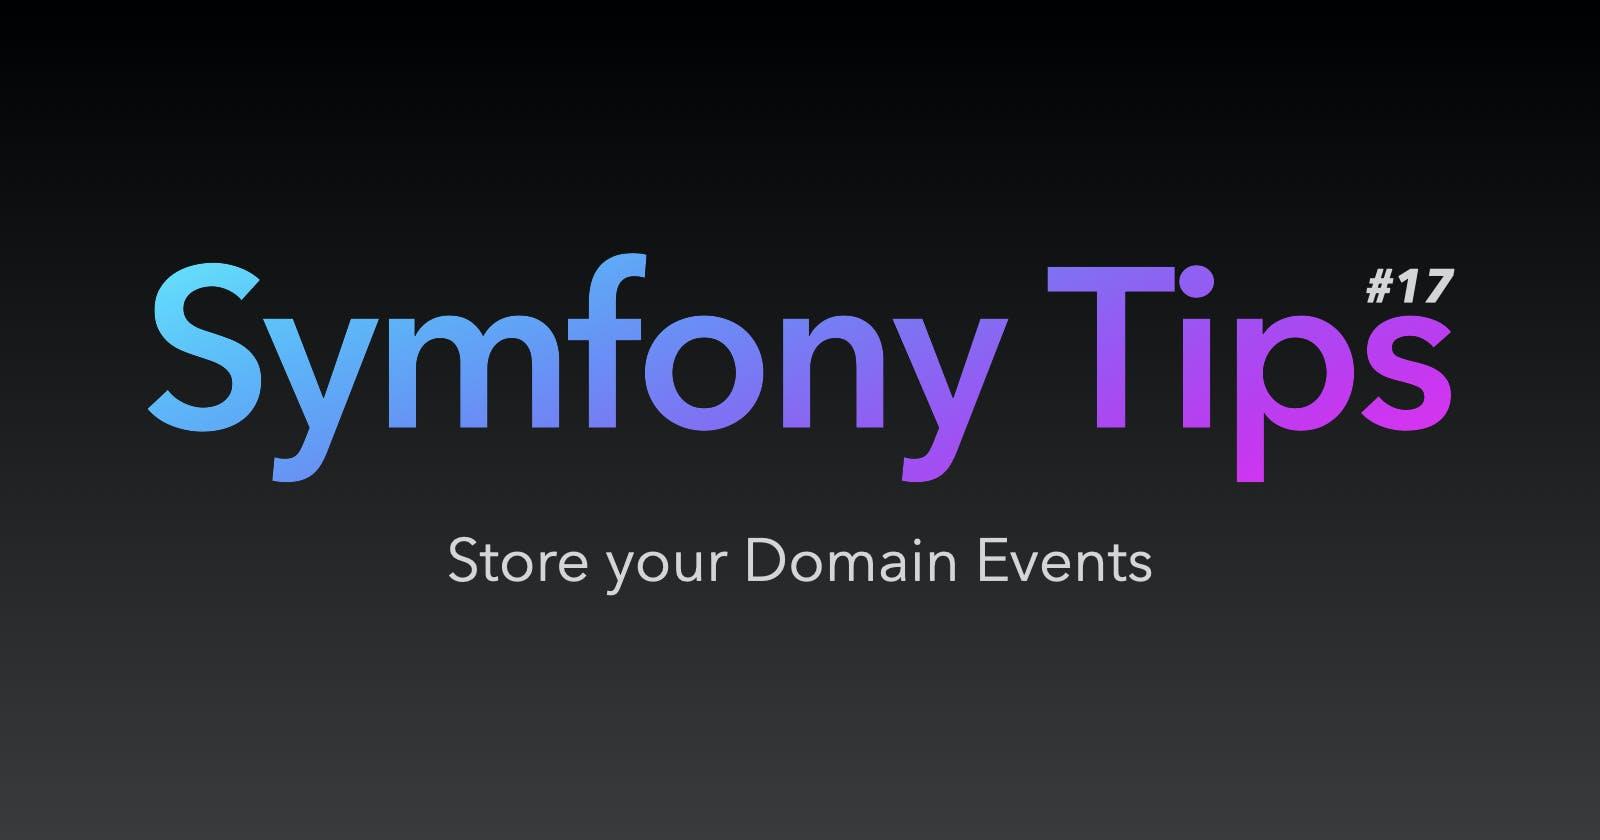 Symfony Tips #17 - Store your Domain Events